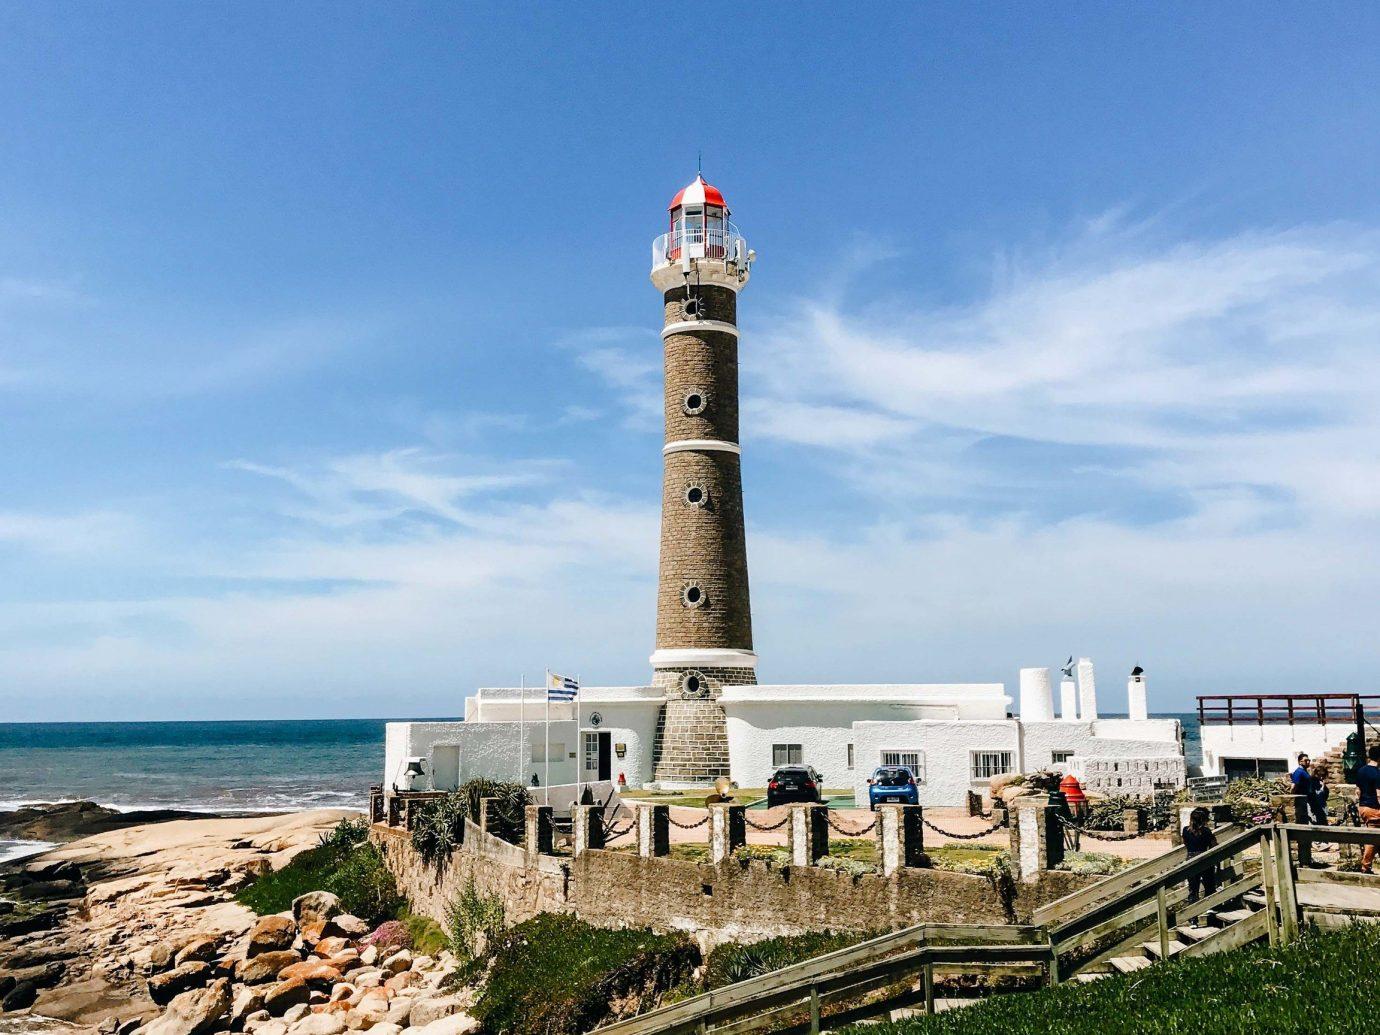 Beach Romantic Getaways south america Trip Ideas Uruguay lighthouse tower sky Sea Coast promontory beacon shore daytime cloud cape